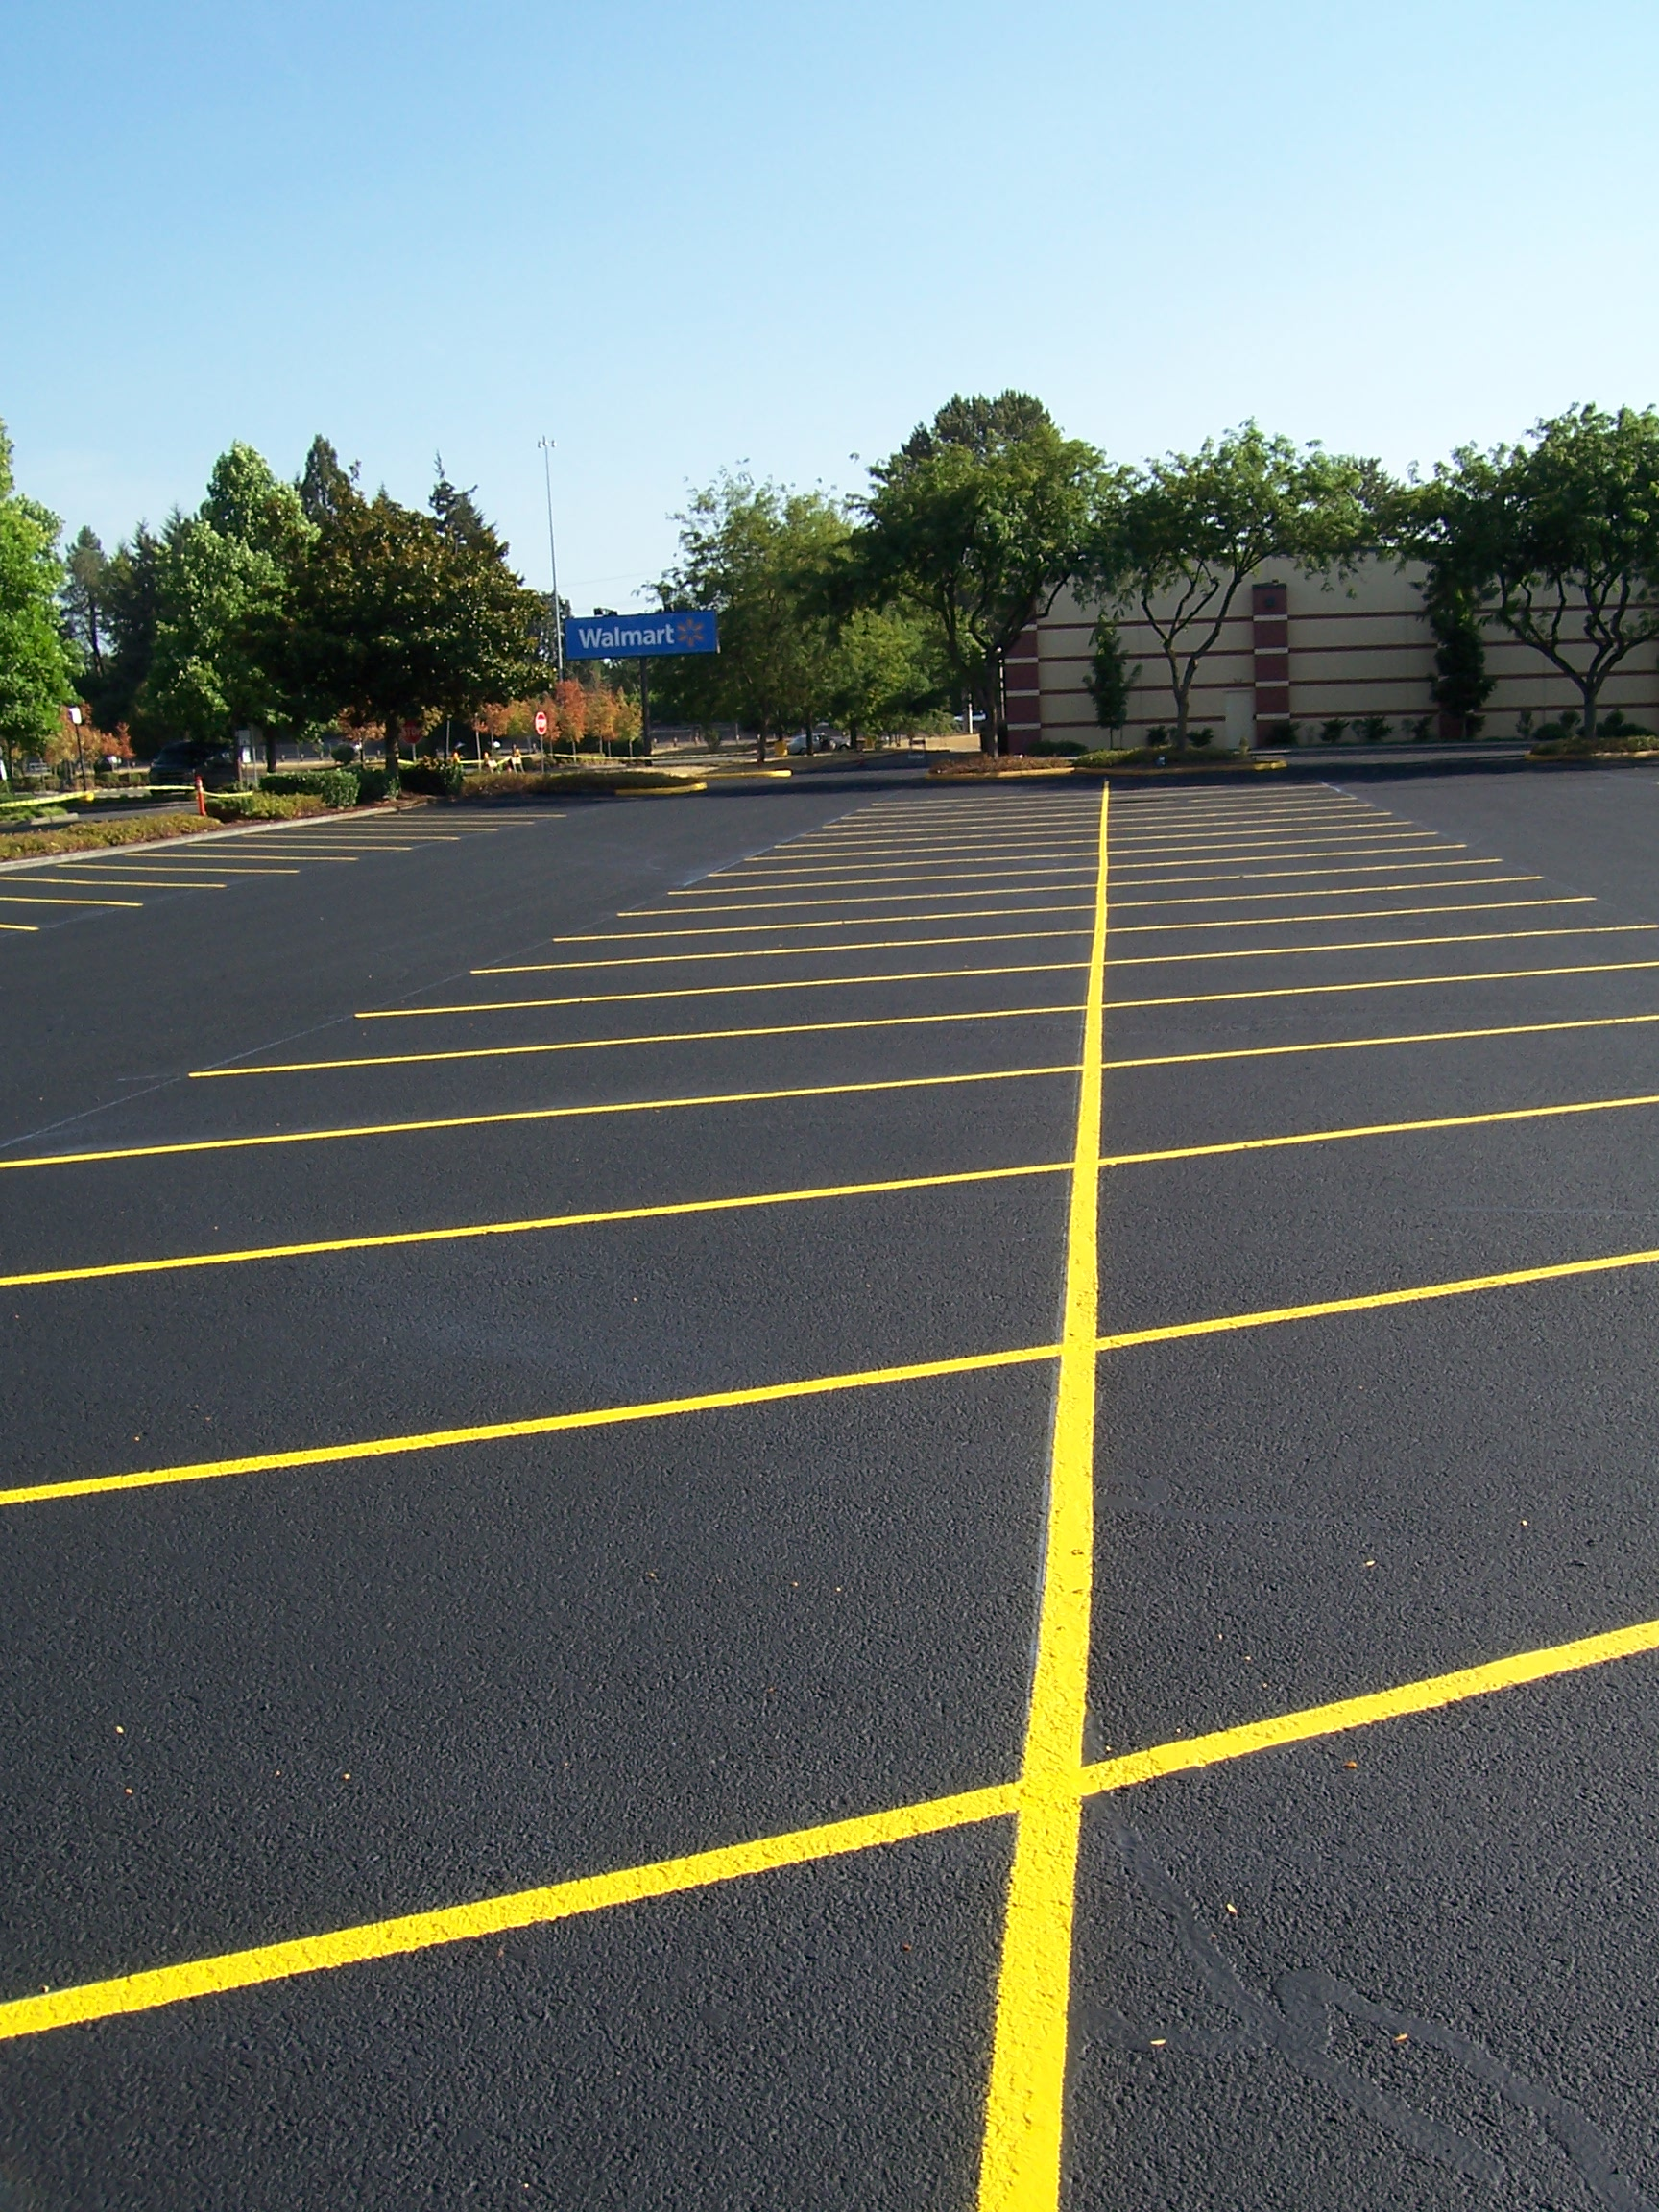 Brand new asphalt on a parking lot